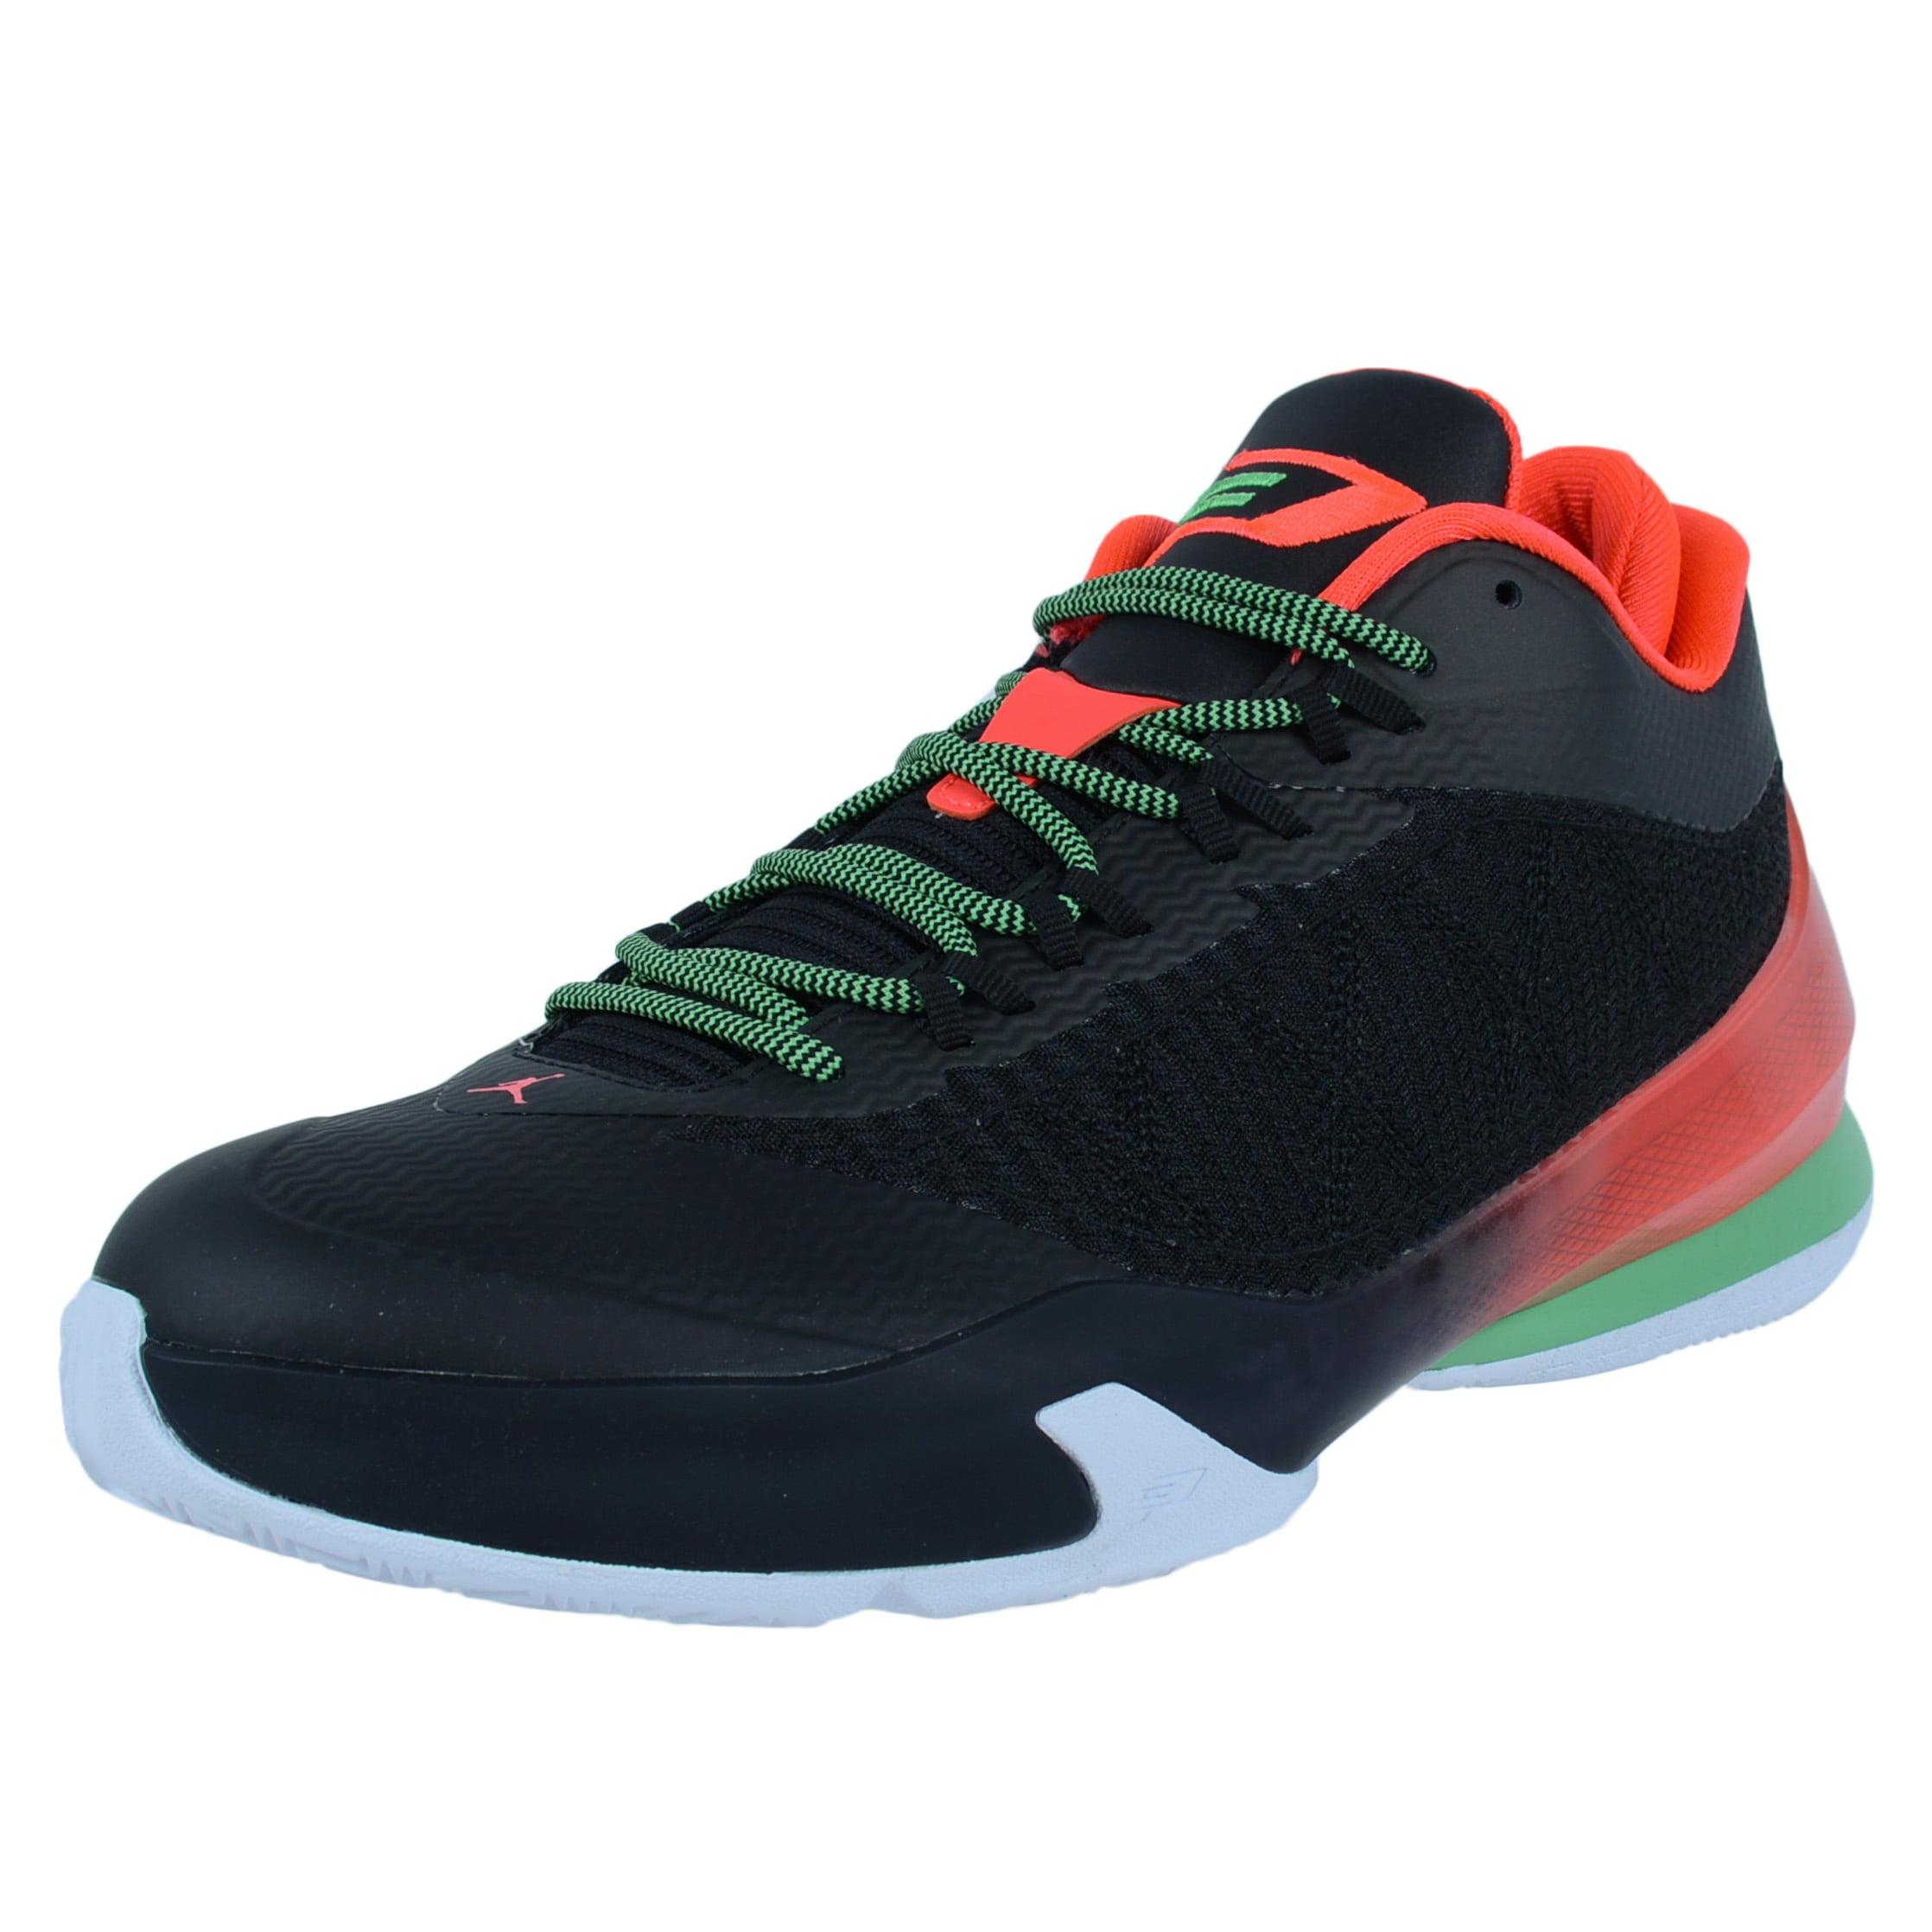 Nike JORDAN CP3.VIII BASKETBALL SHOES BLACK LIGHT GREEN S...